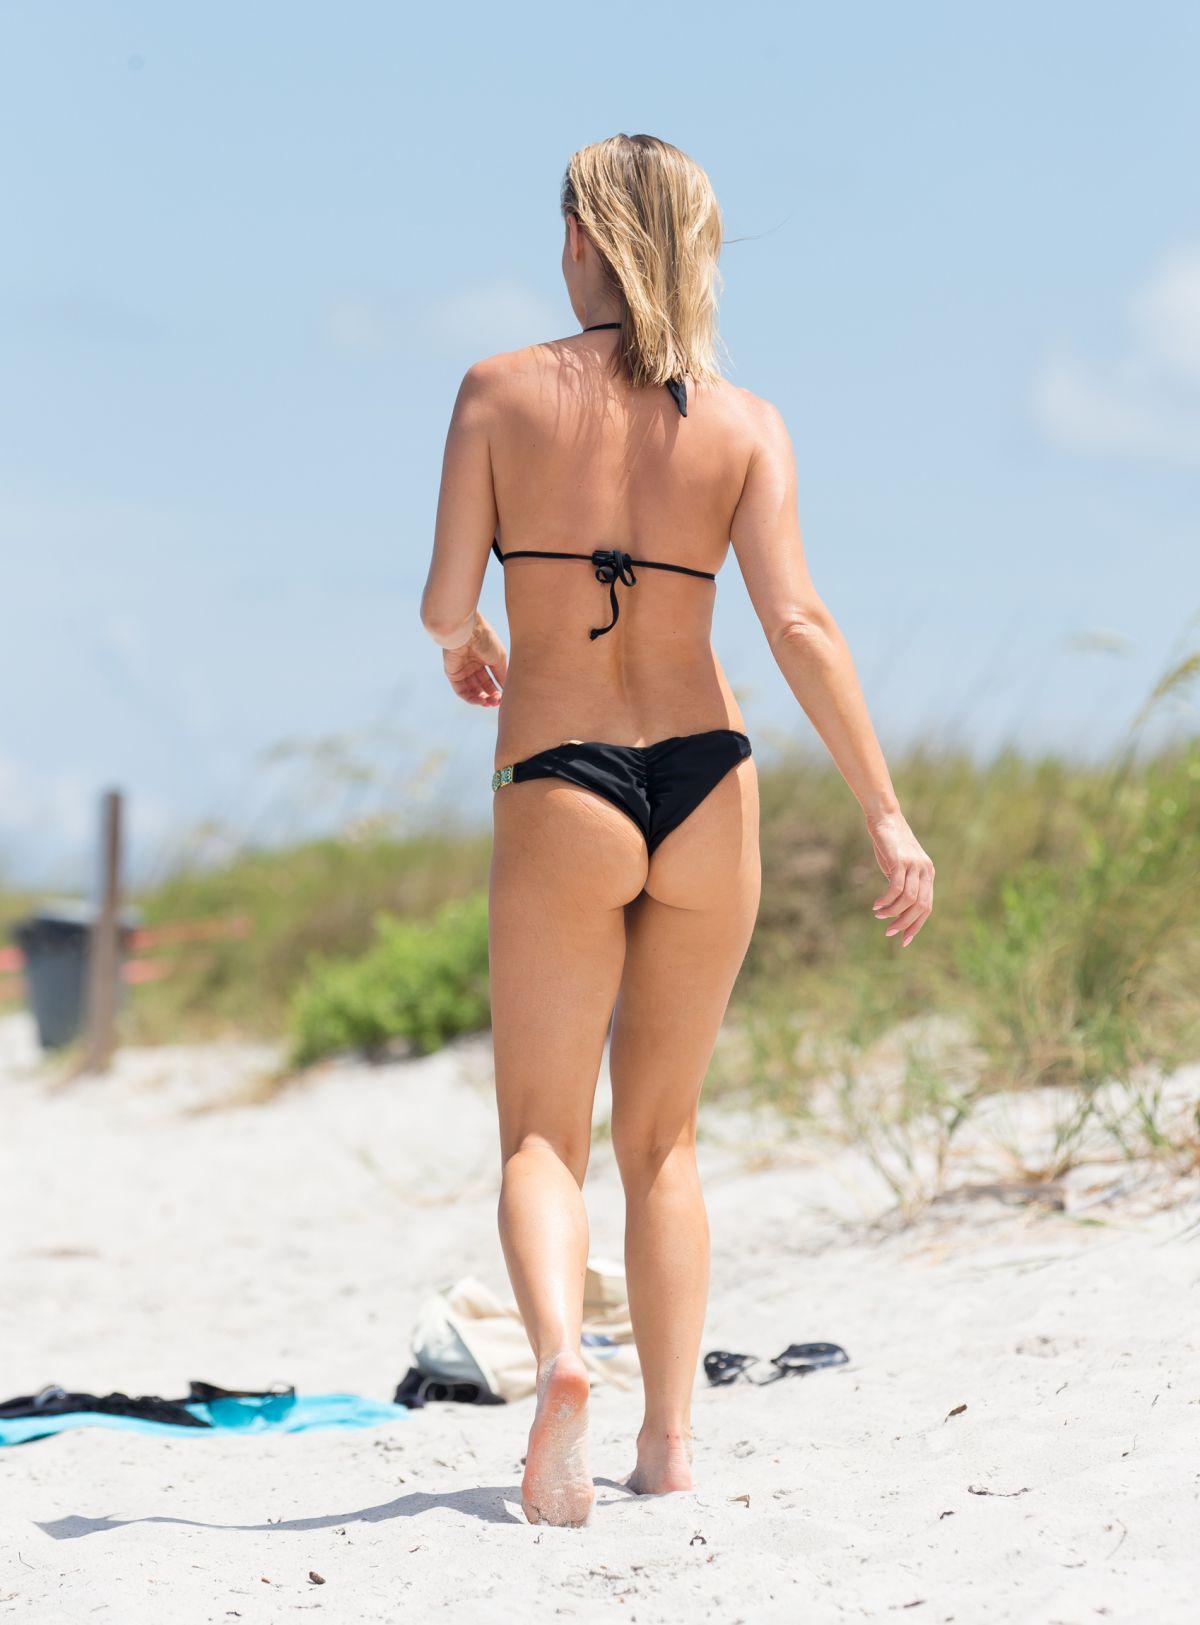 Ass Booty Joanna Krupa naked photo 2017